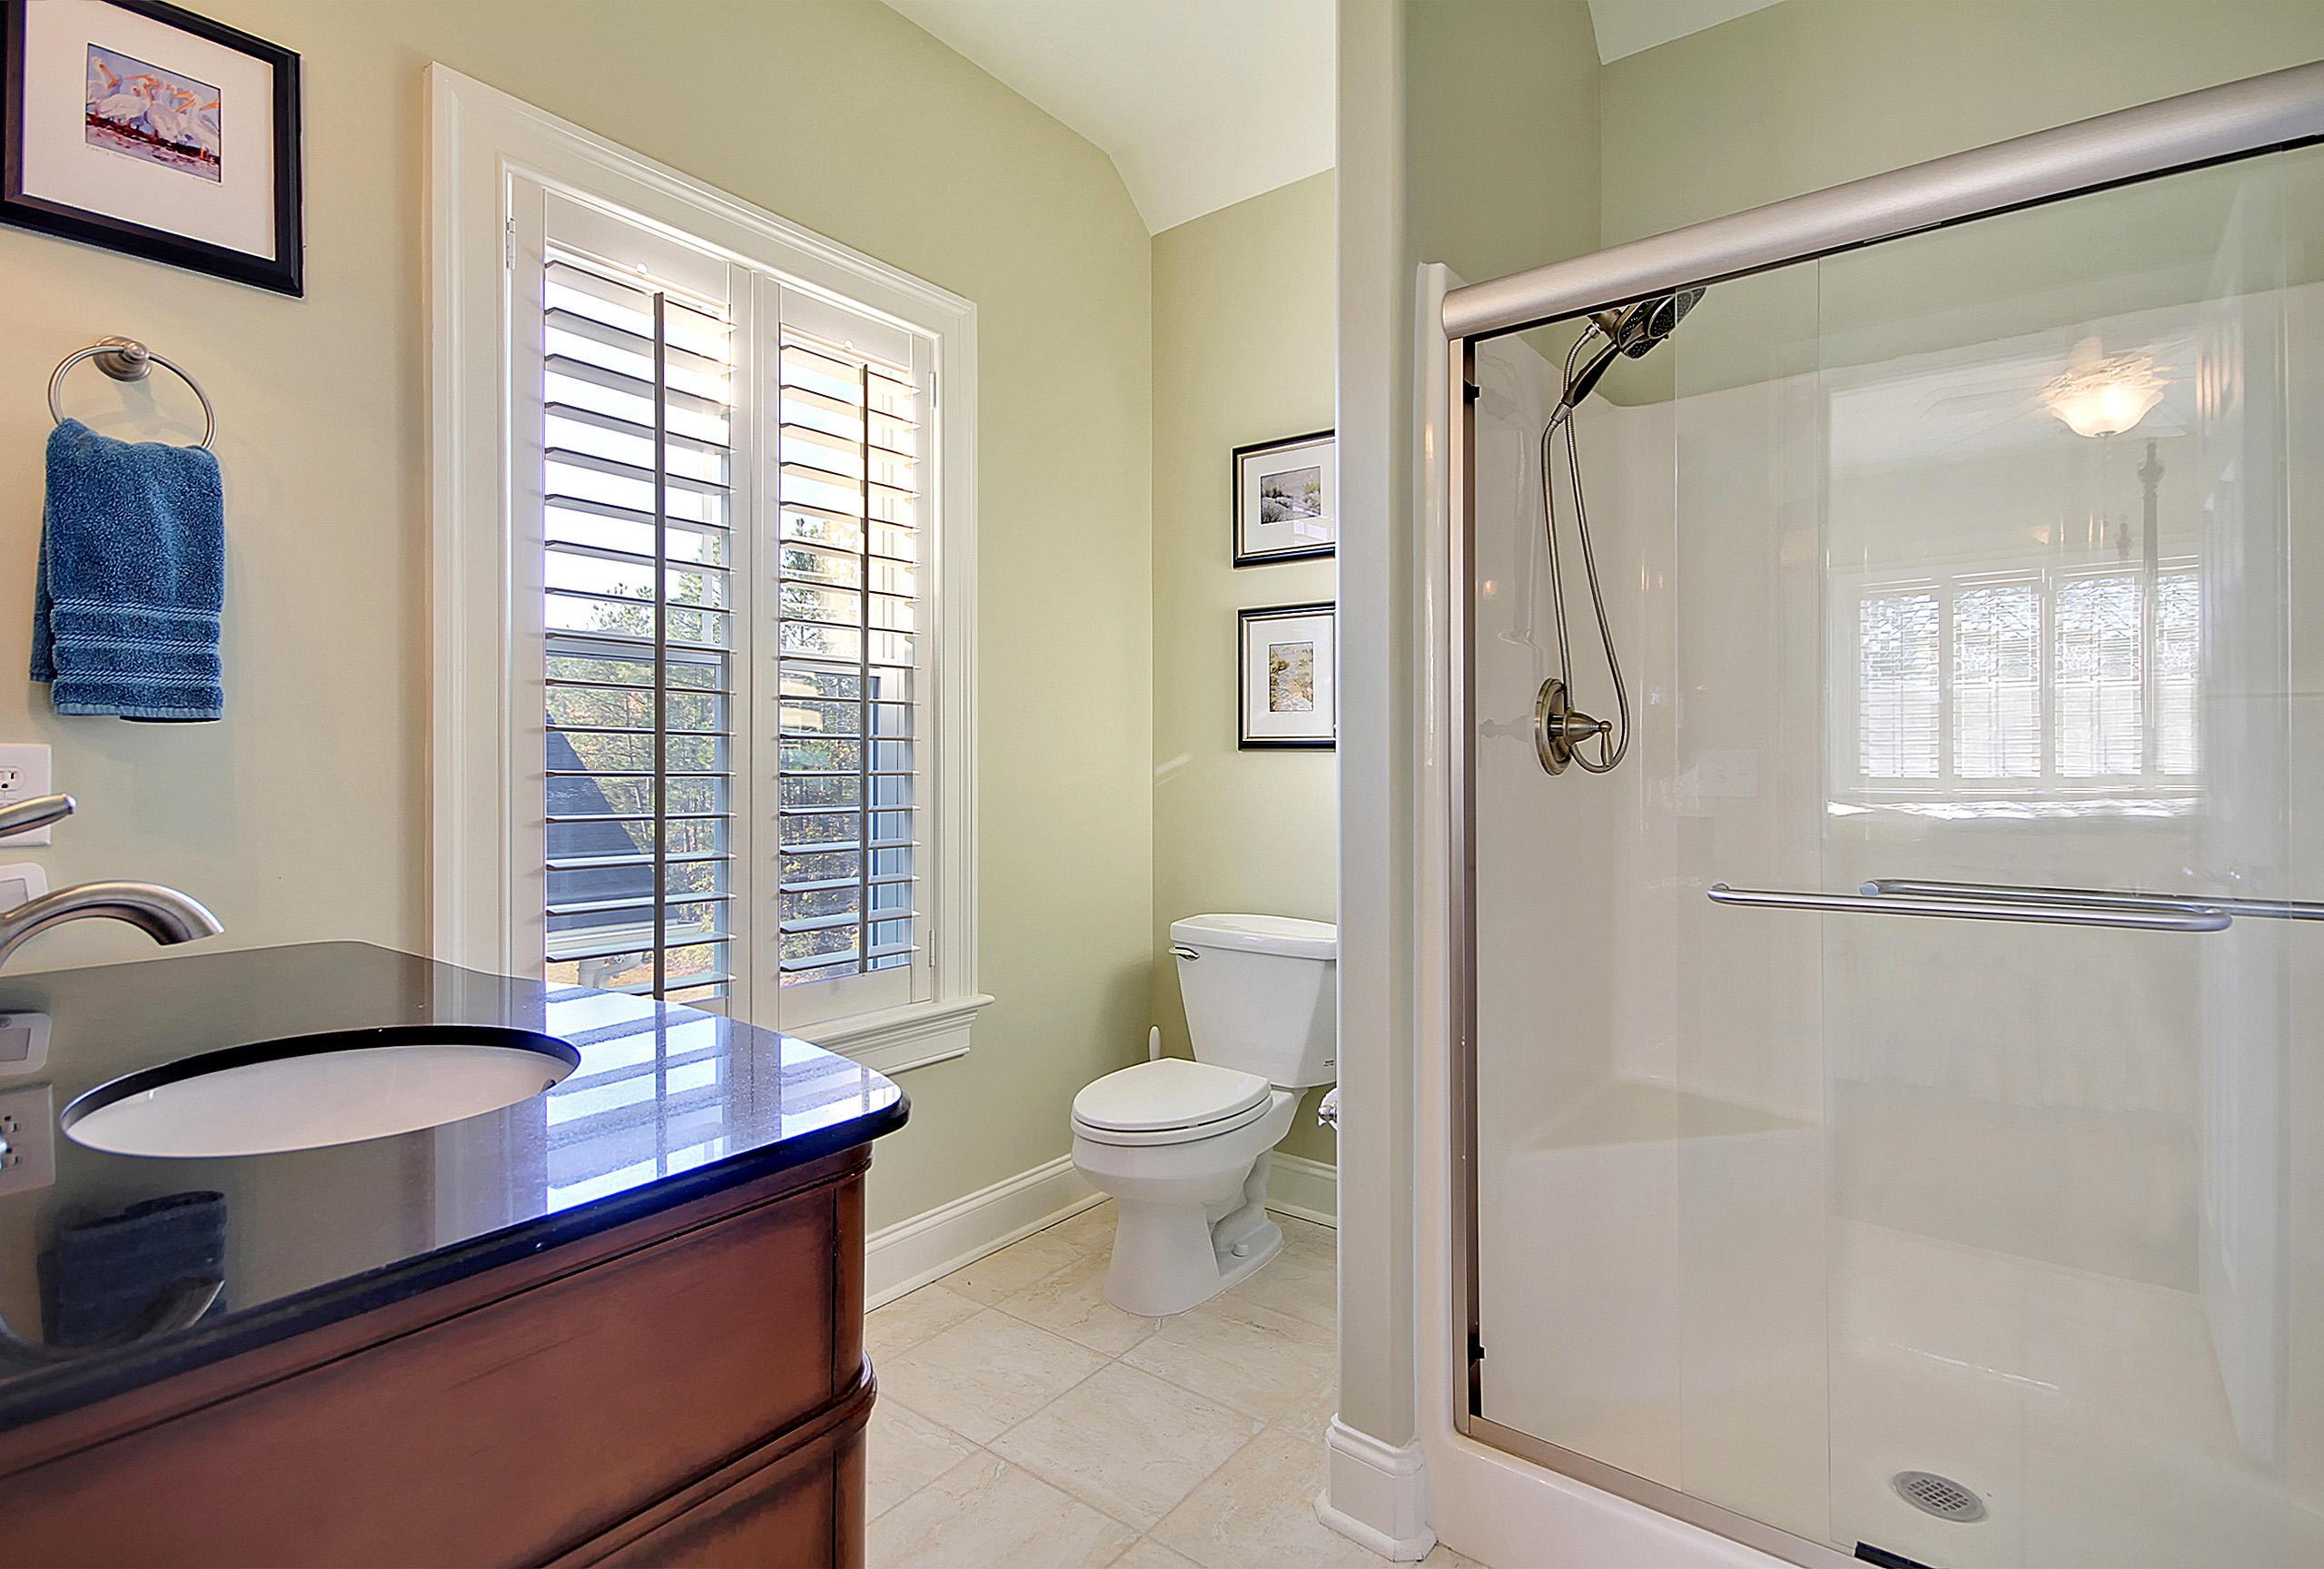 Rivertowne Country Club Homes For Sale - 2601 Kiln Creek, Mount Pleasant, SC - 56